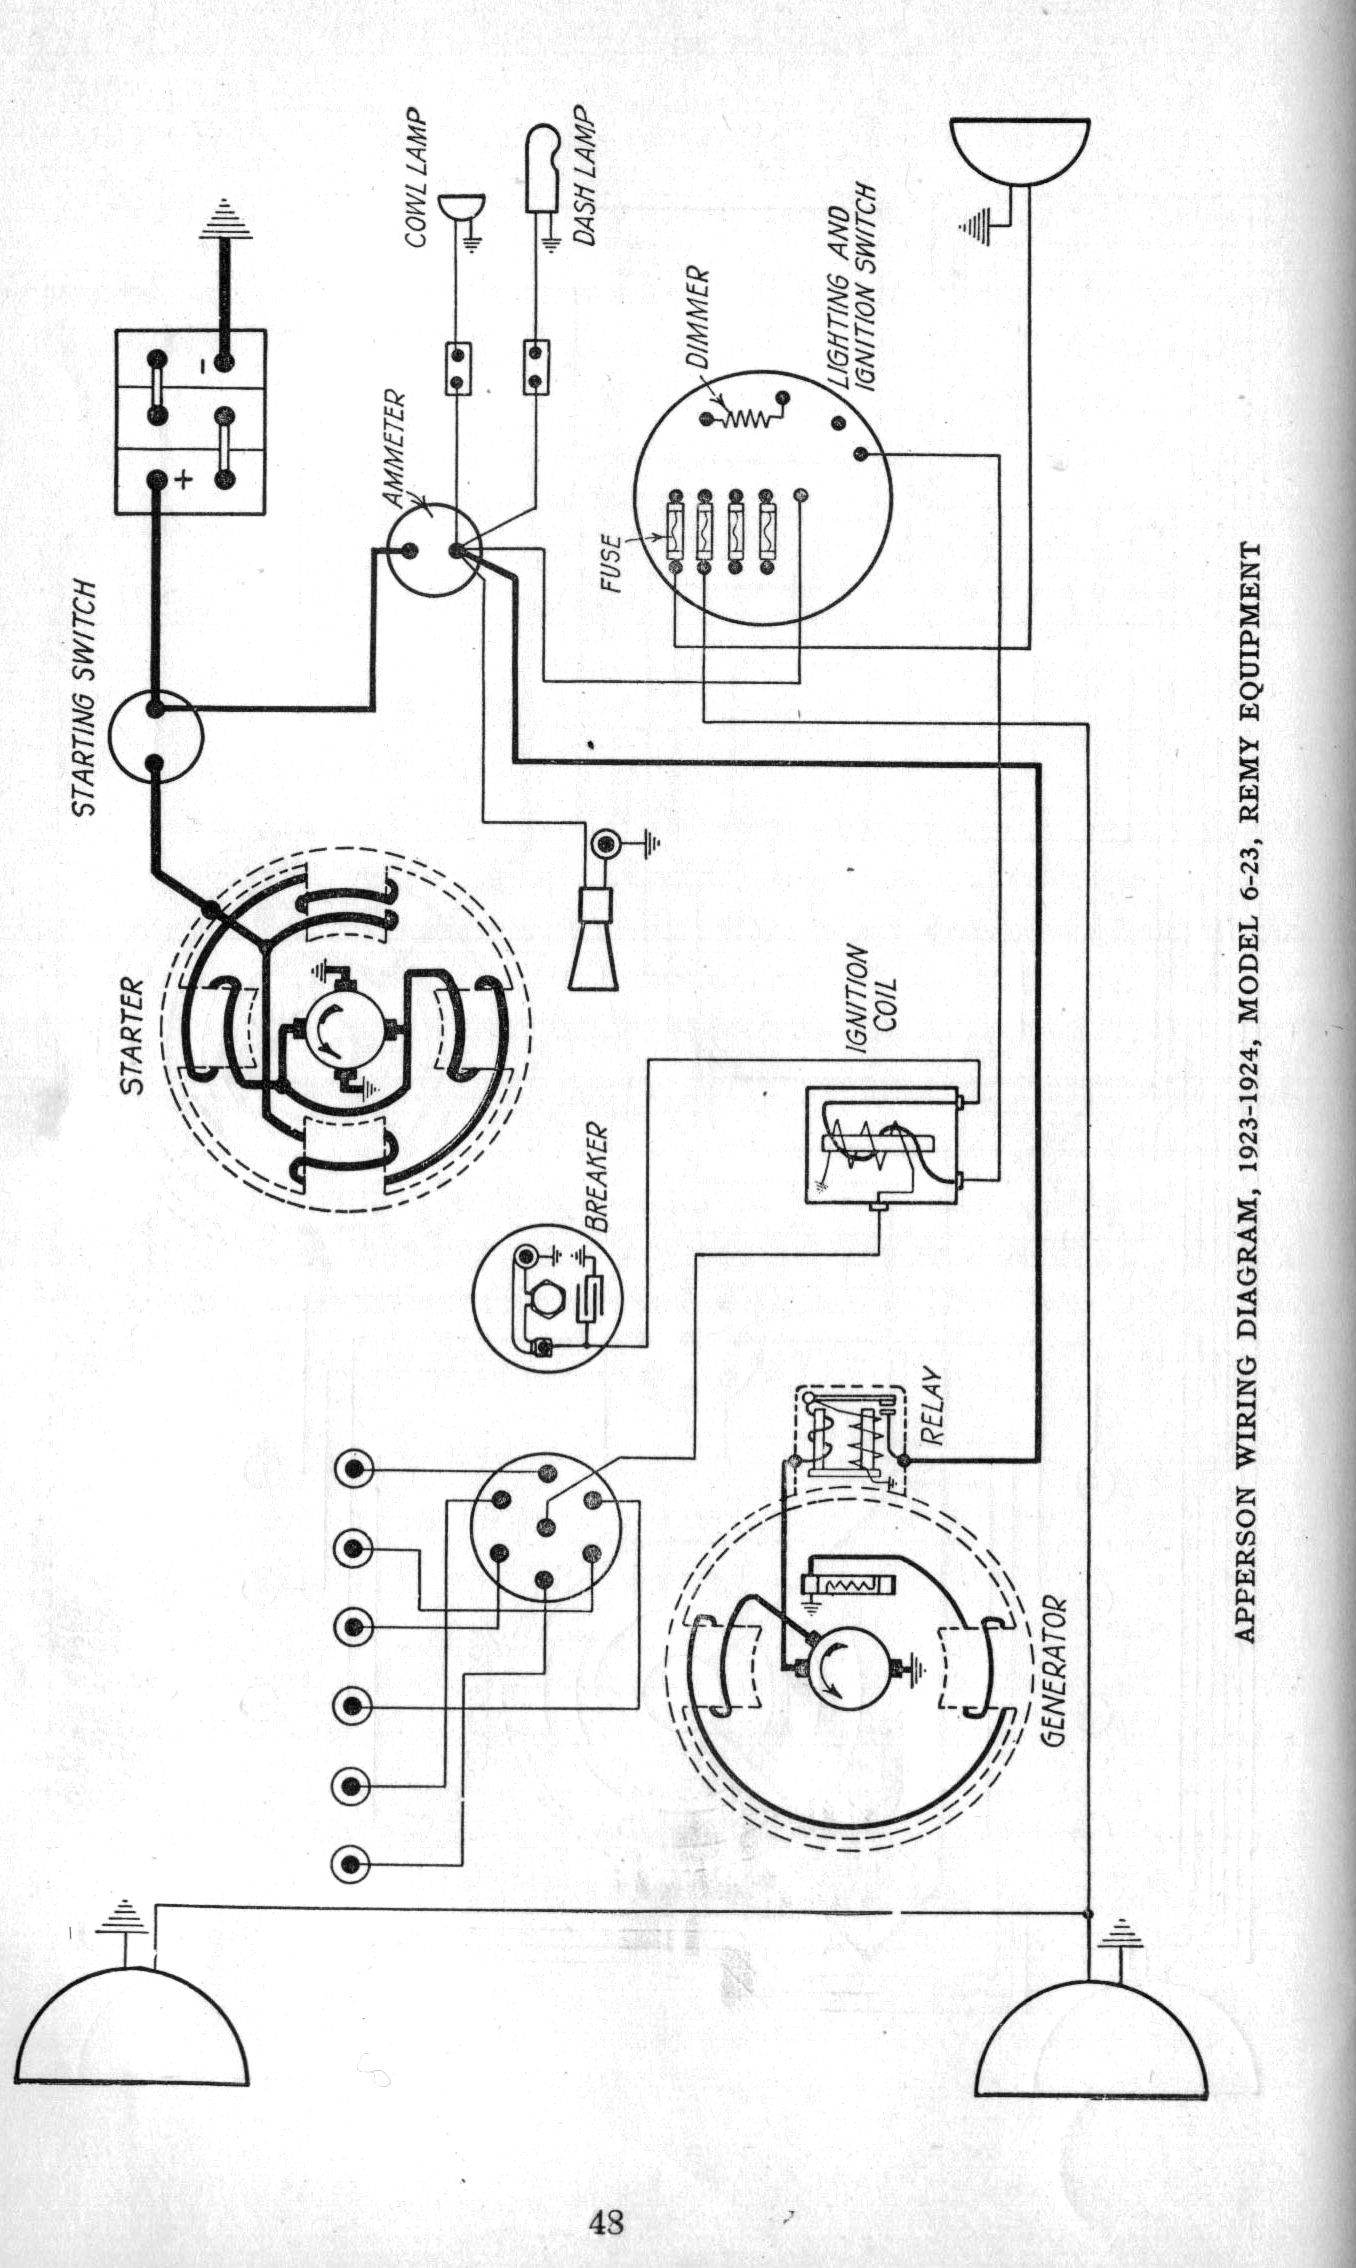 6 electrical schematic wiring diagram